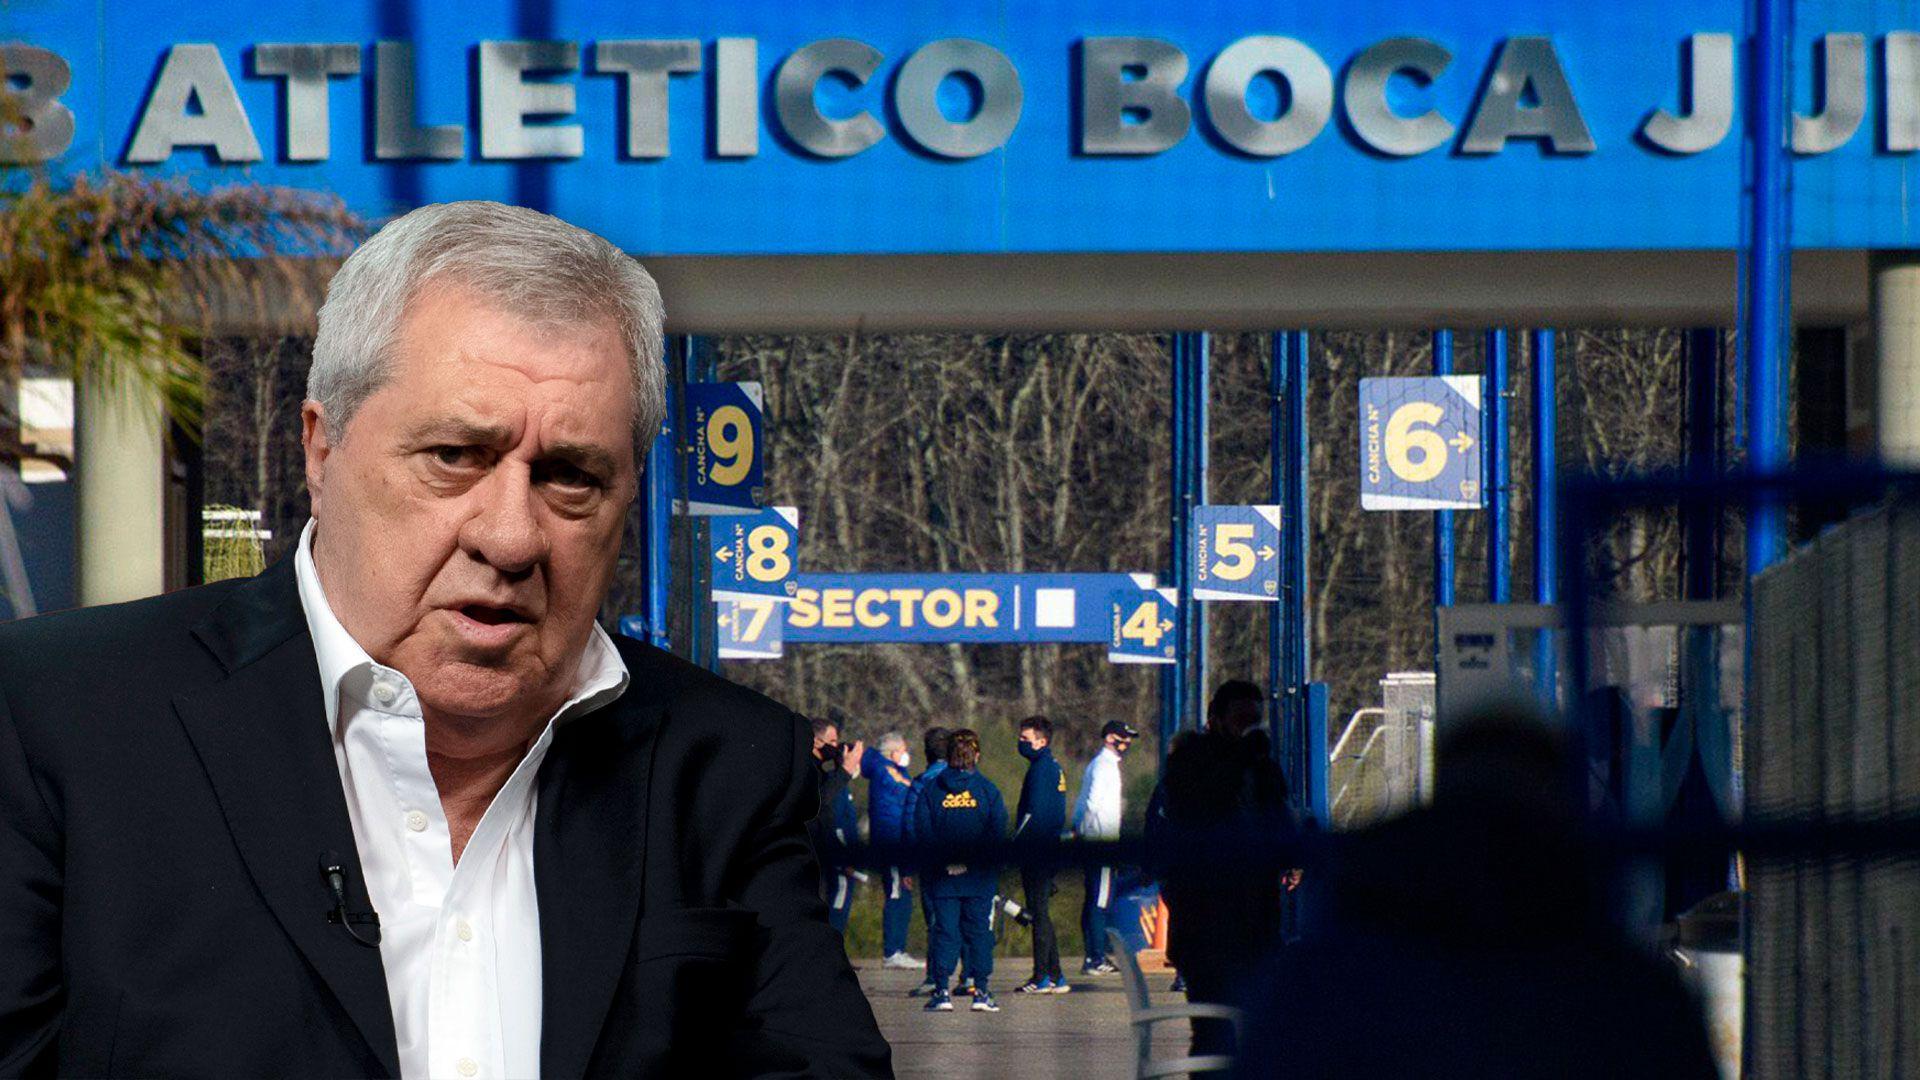 Jorge Ameal burbuja Boca